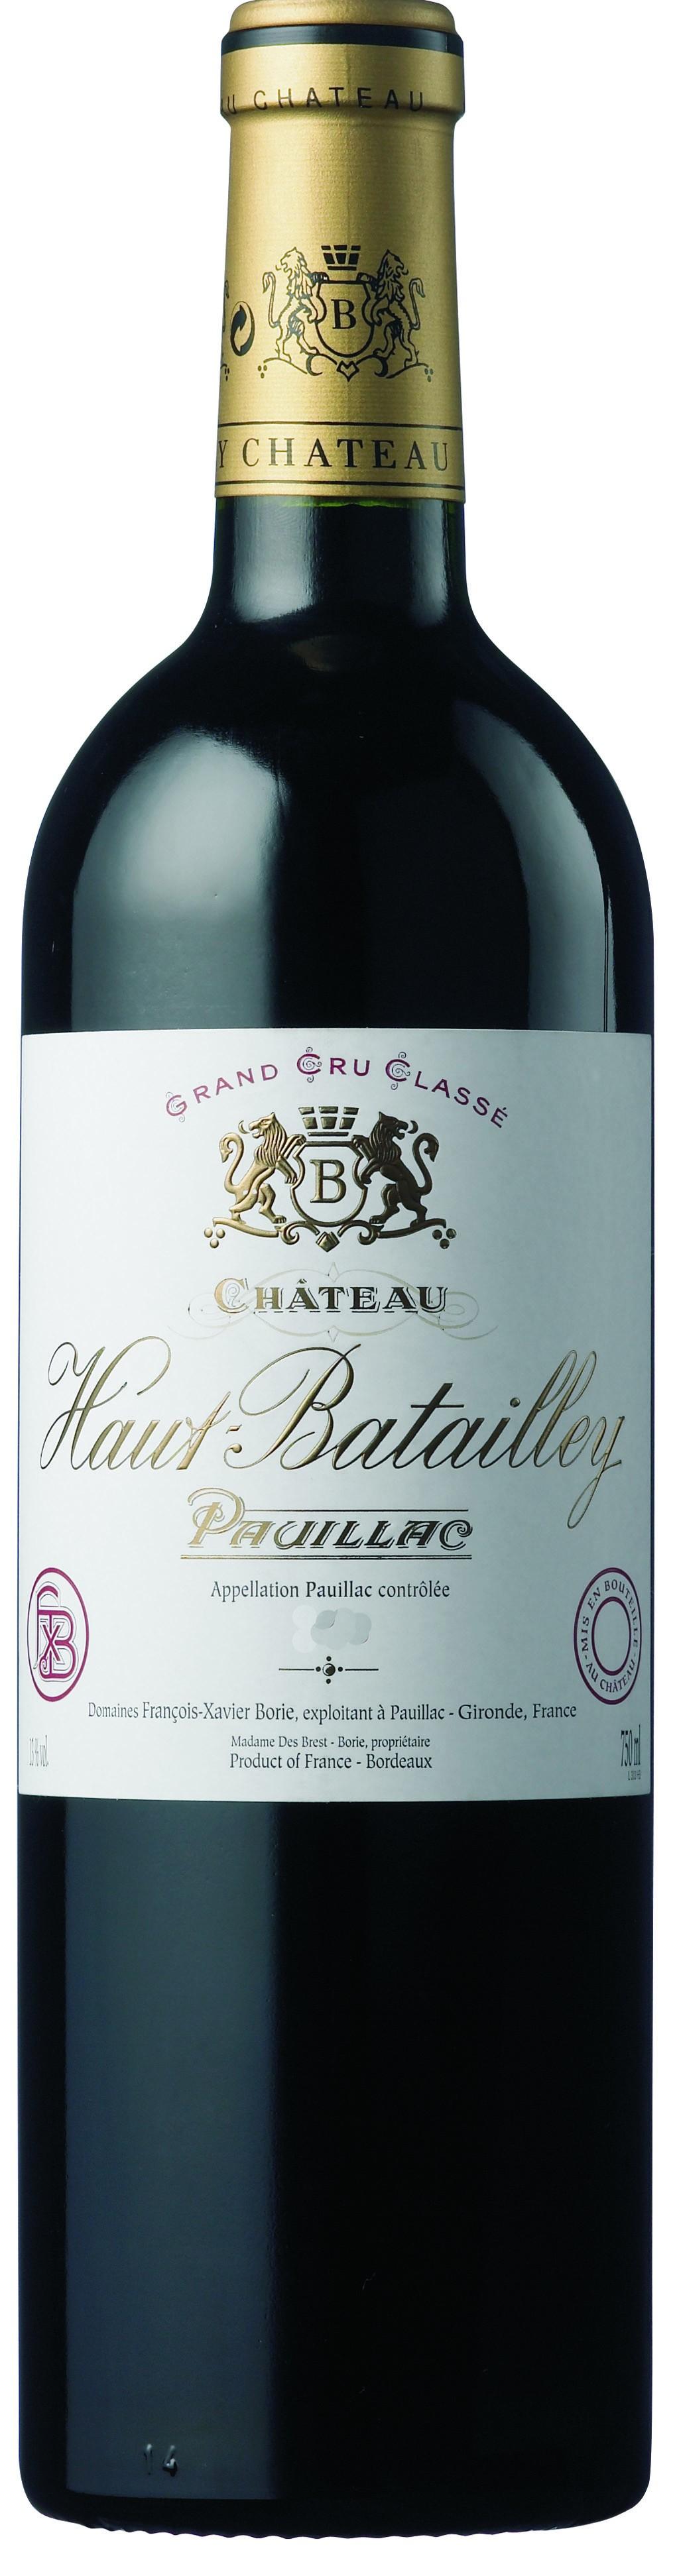 Chateau-Haut-Batailley-verkopen